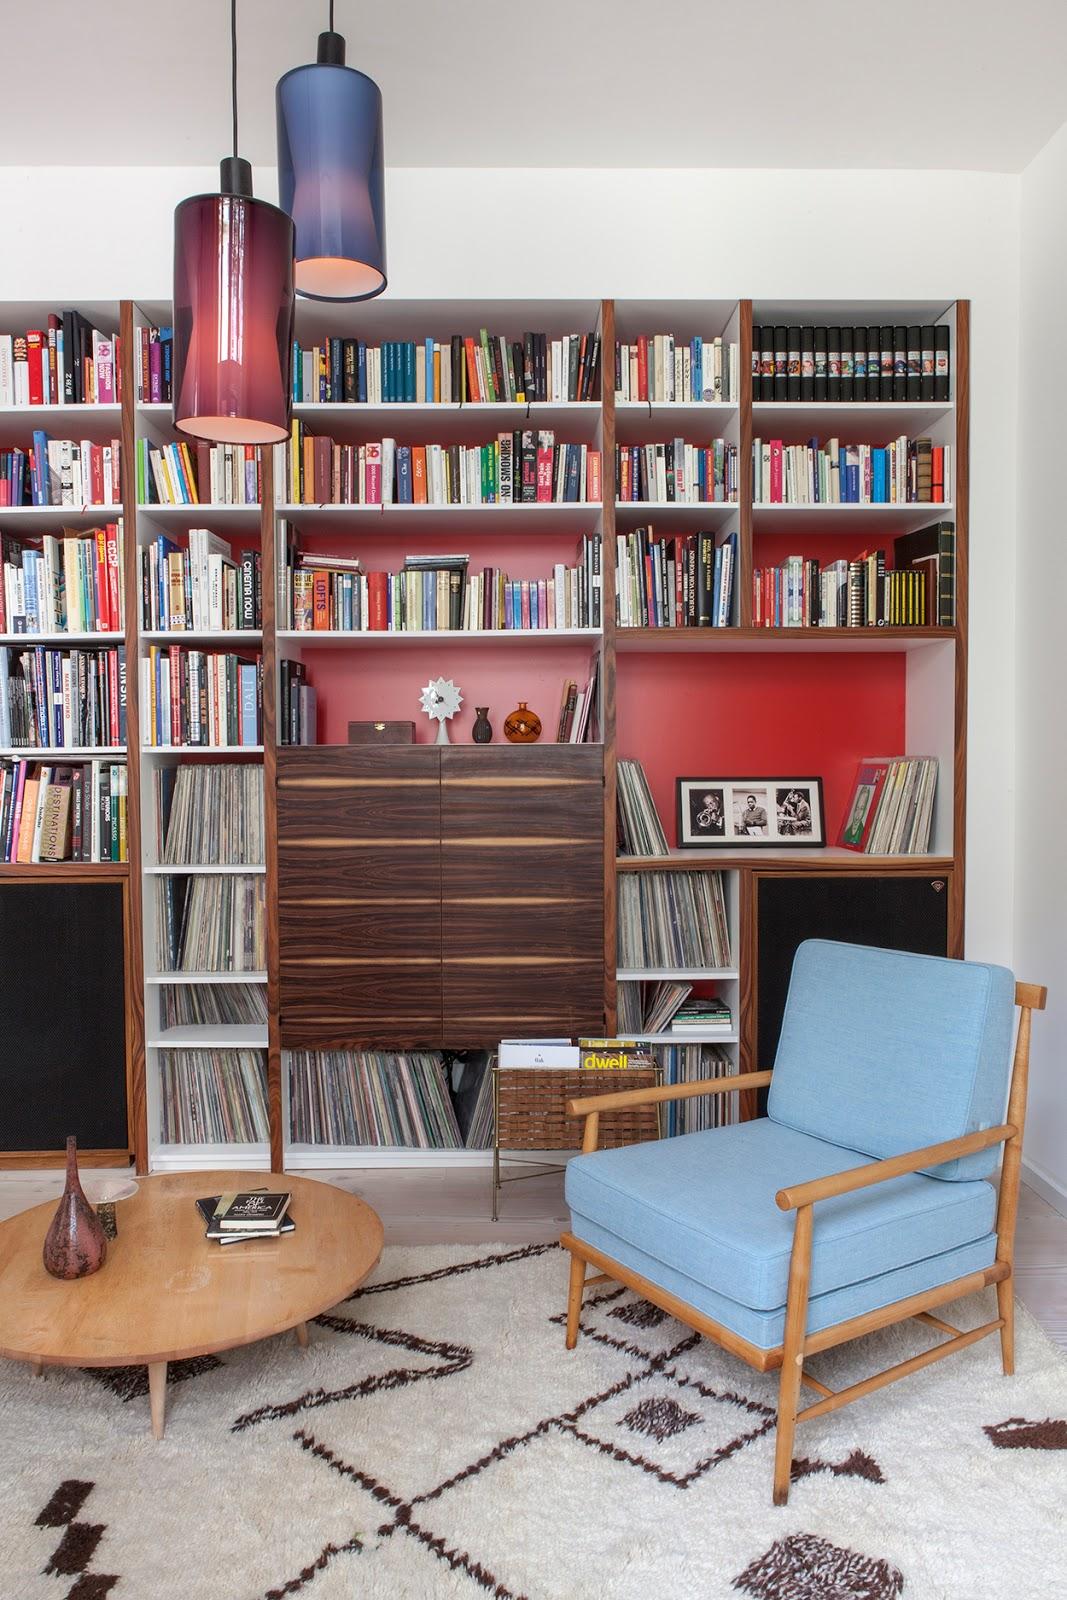 amazing designer loft in berlin with mdi century modern design, noguchi lamp, pattern carpet, pottery collection, light blue armchair